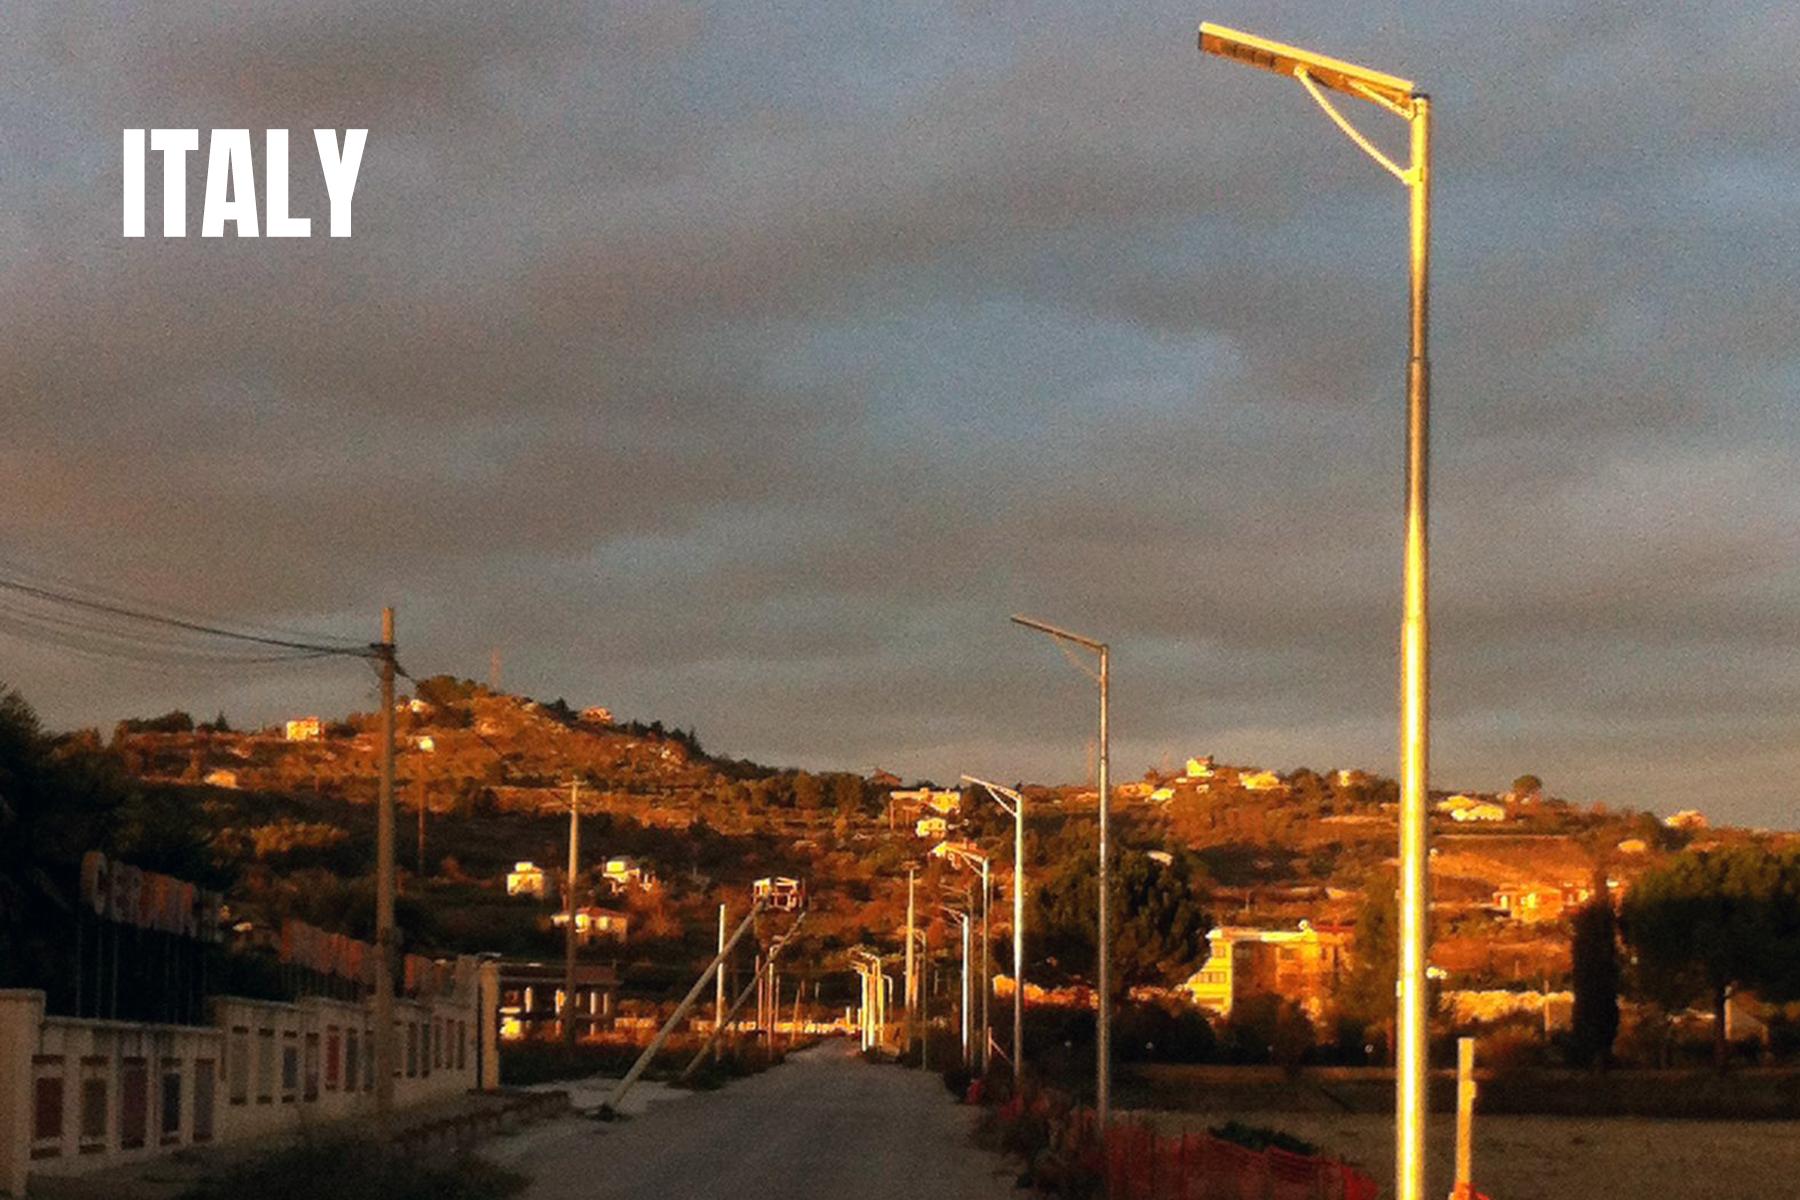 S3 Website - Image Carousel - 04 Sicily.